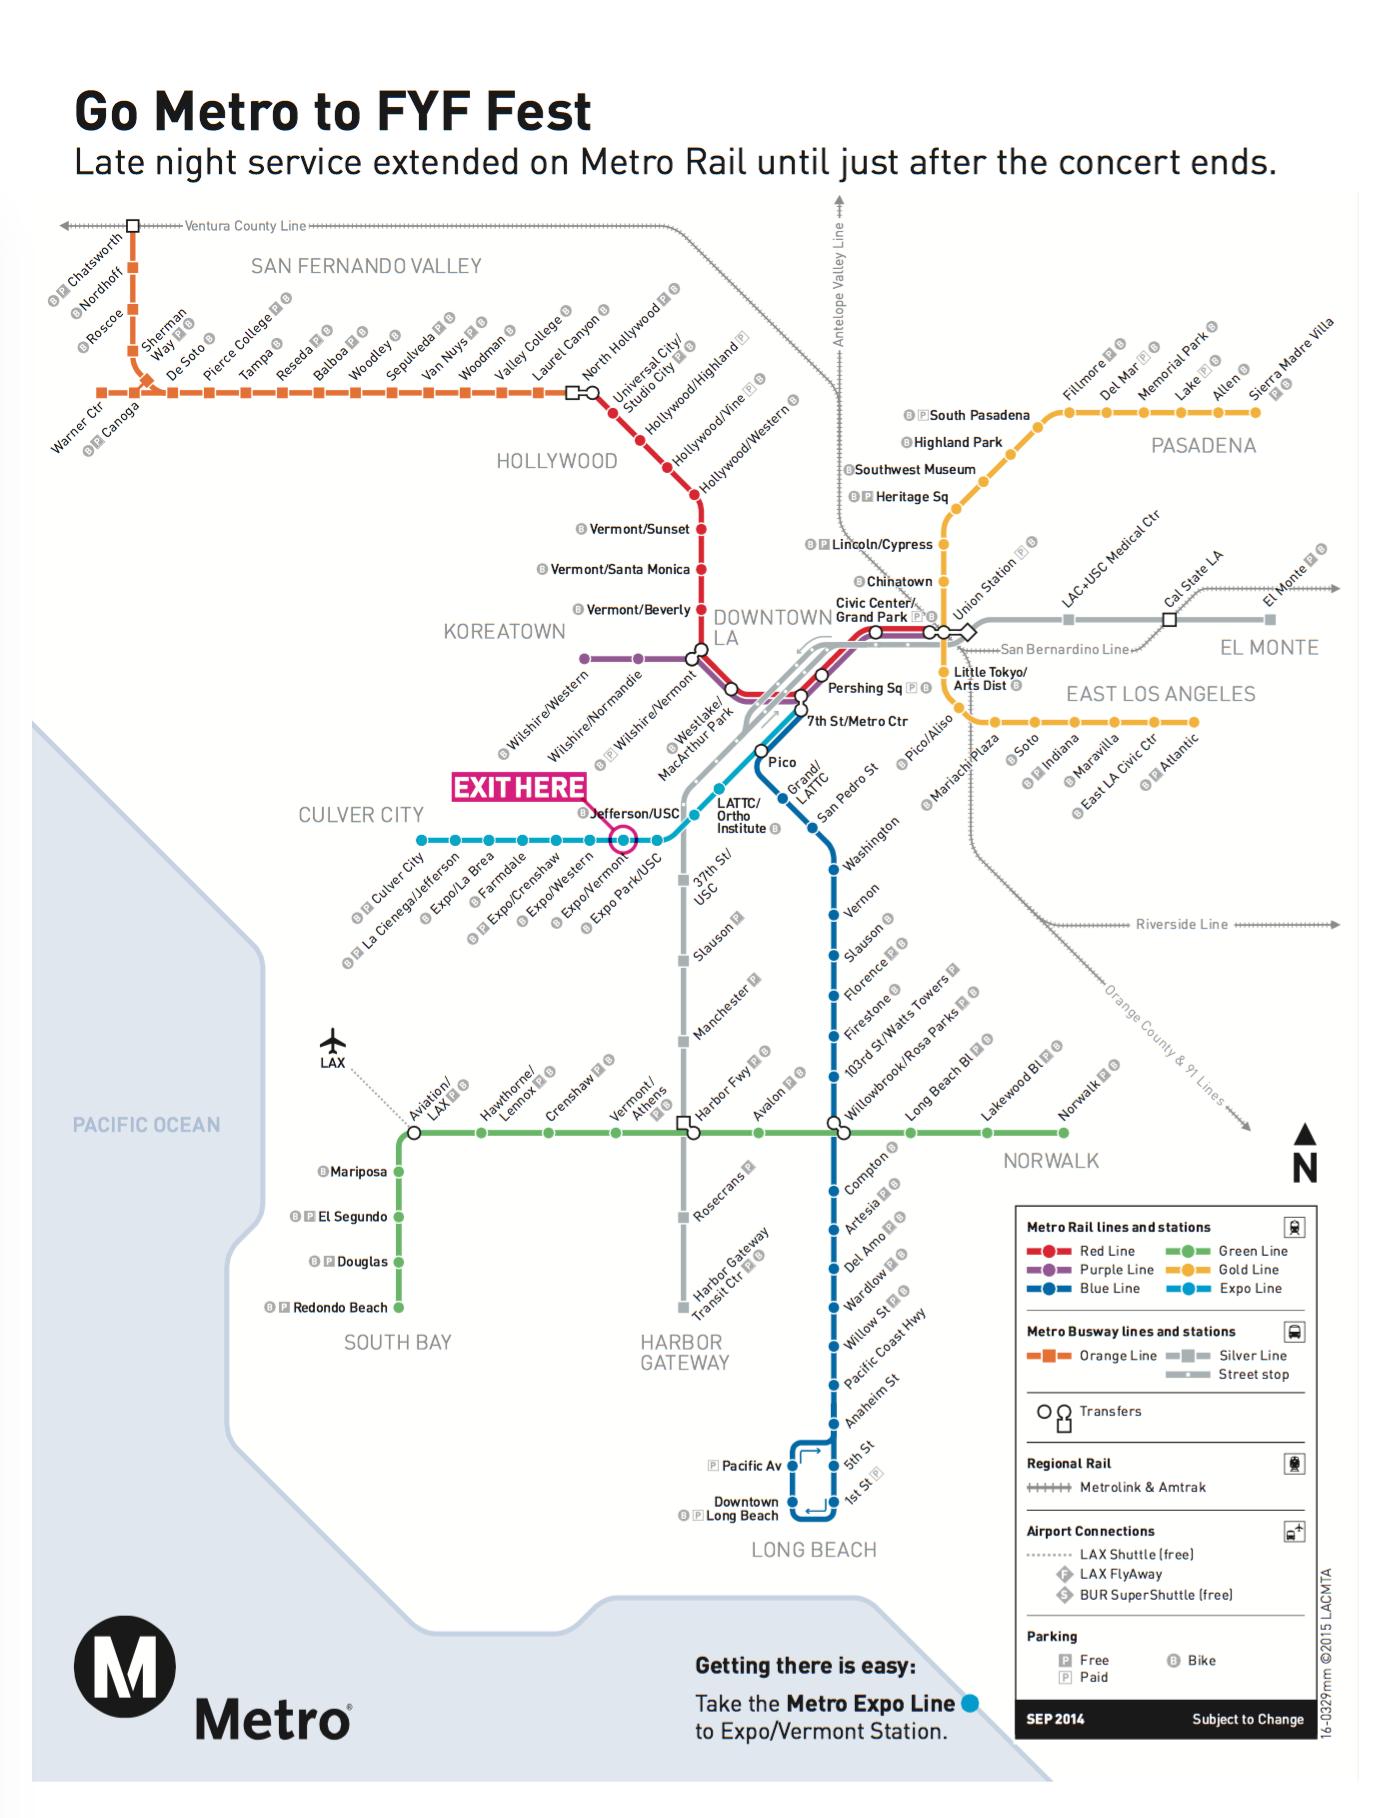 fyf fest map 2015